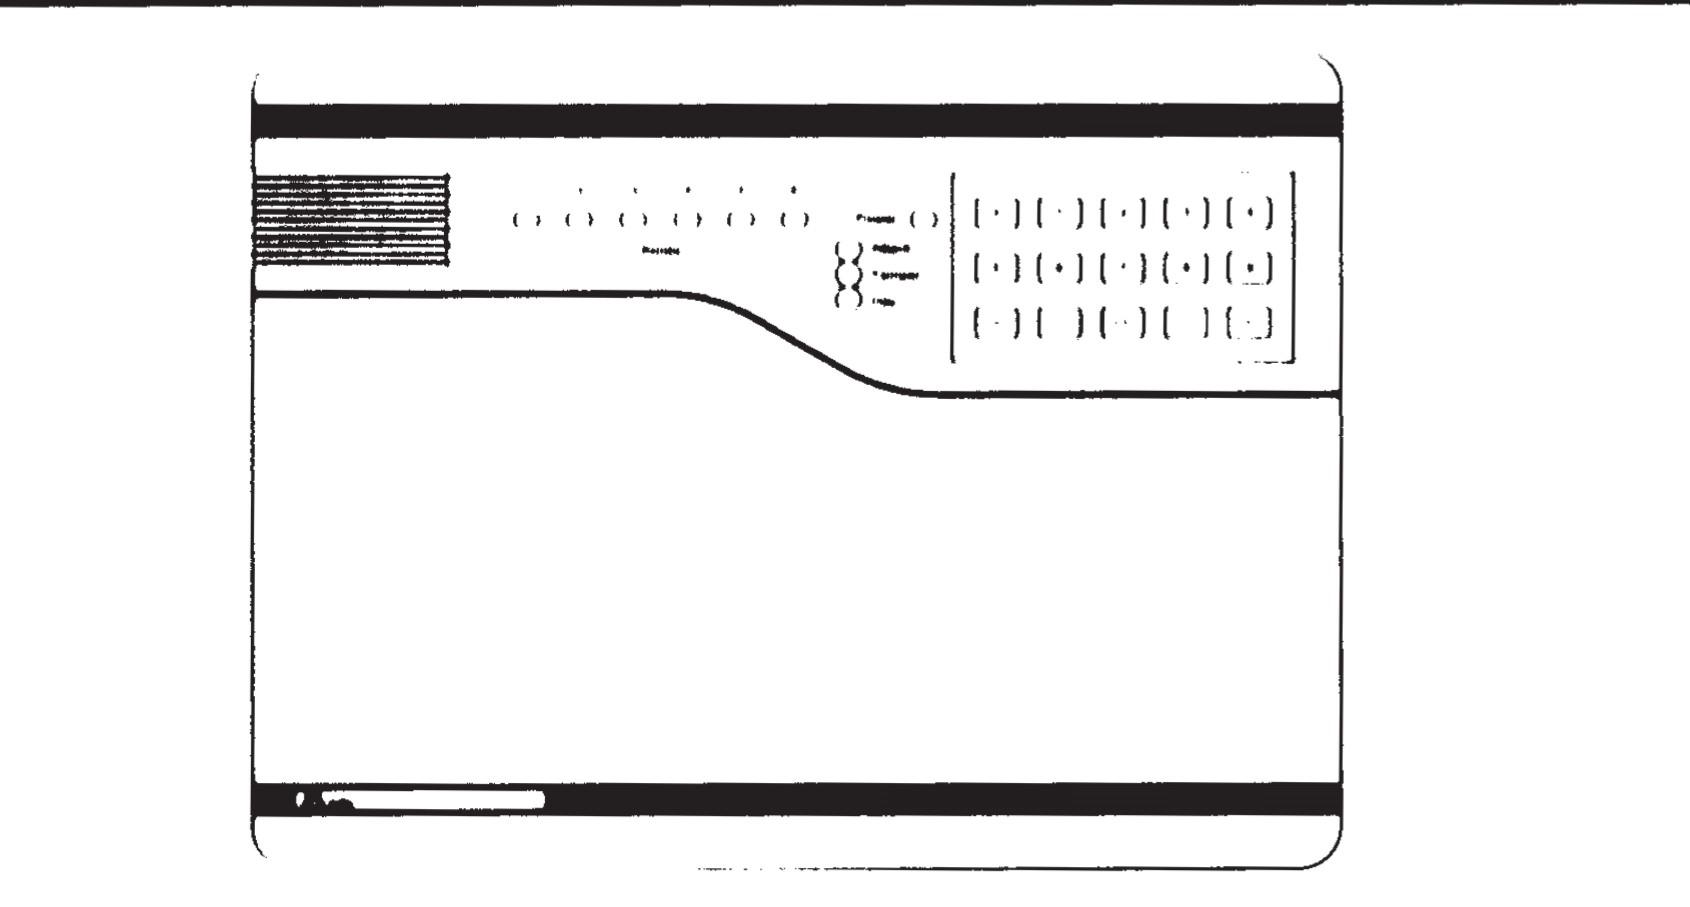 Citadel XR2 - Members Lounge (Public) - Security Installer